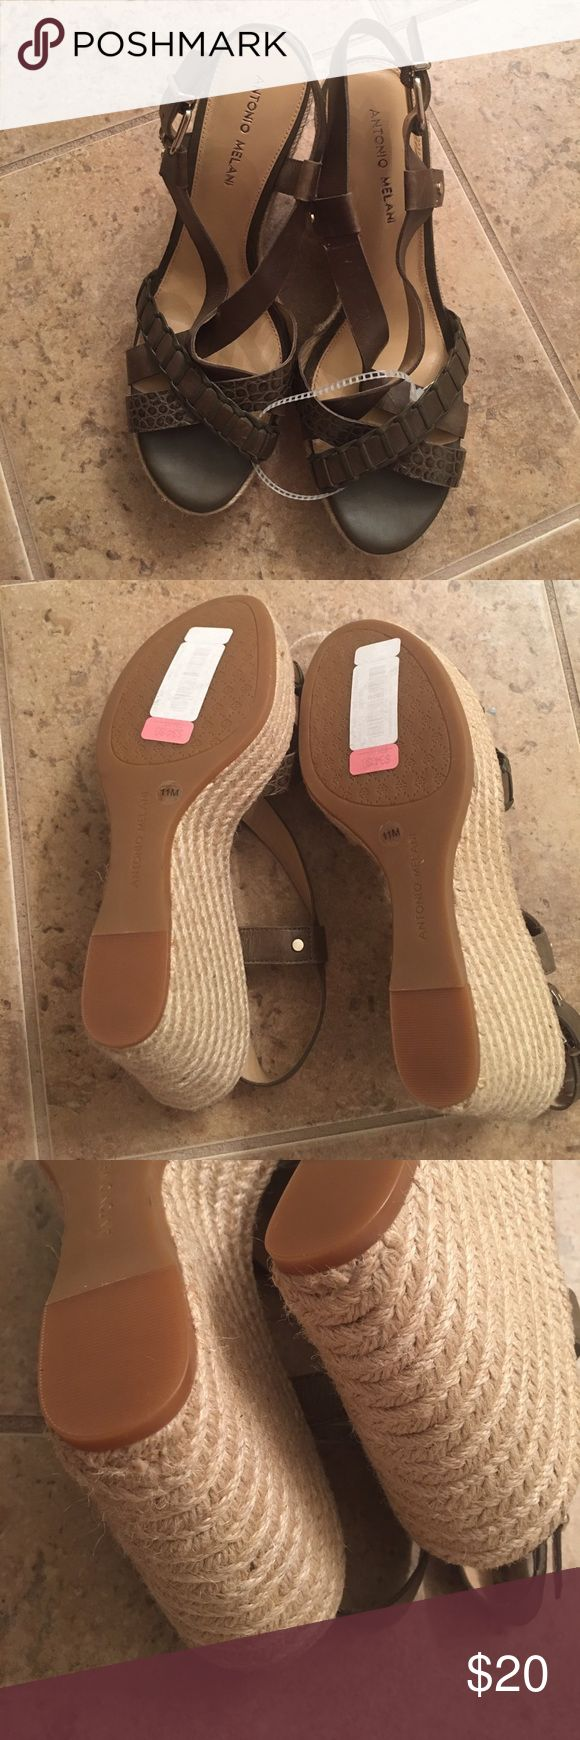 Olive Green Espadrilles Never been worn! ANTONIO MELANI Shoes Espadrilles